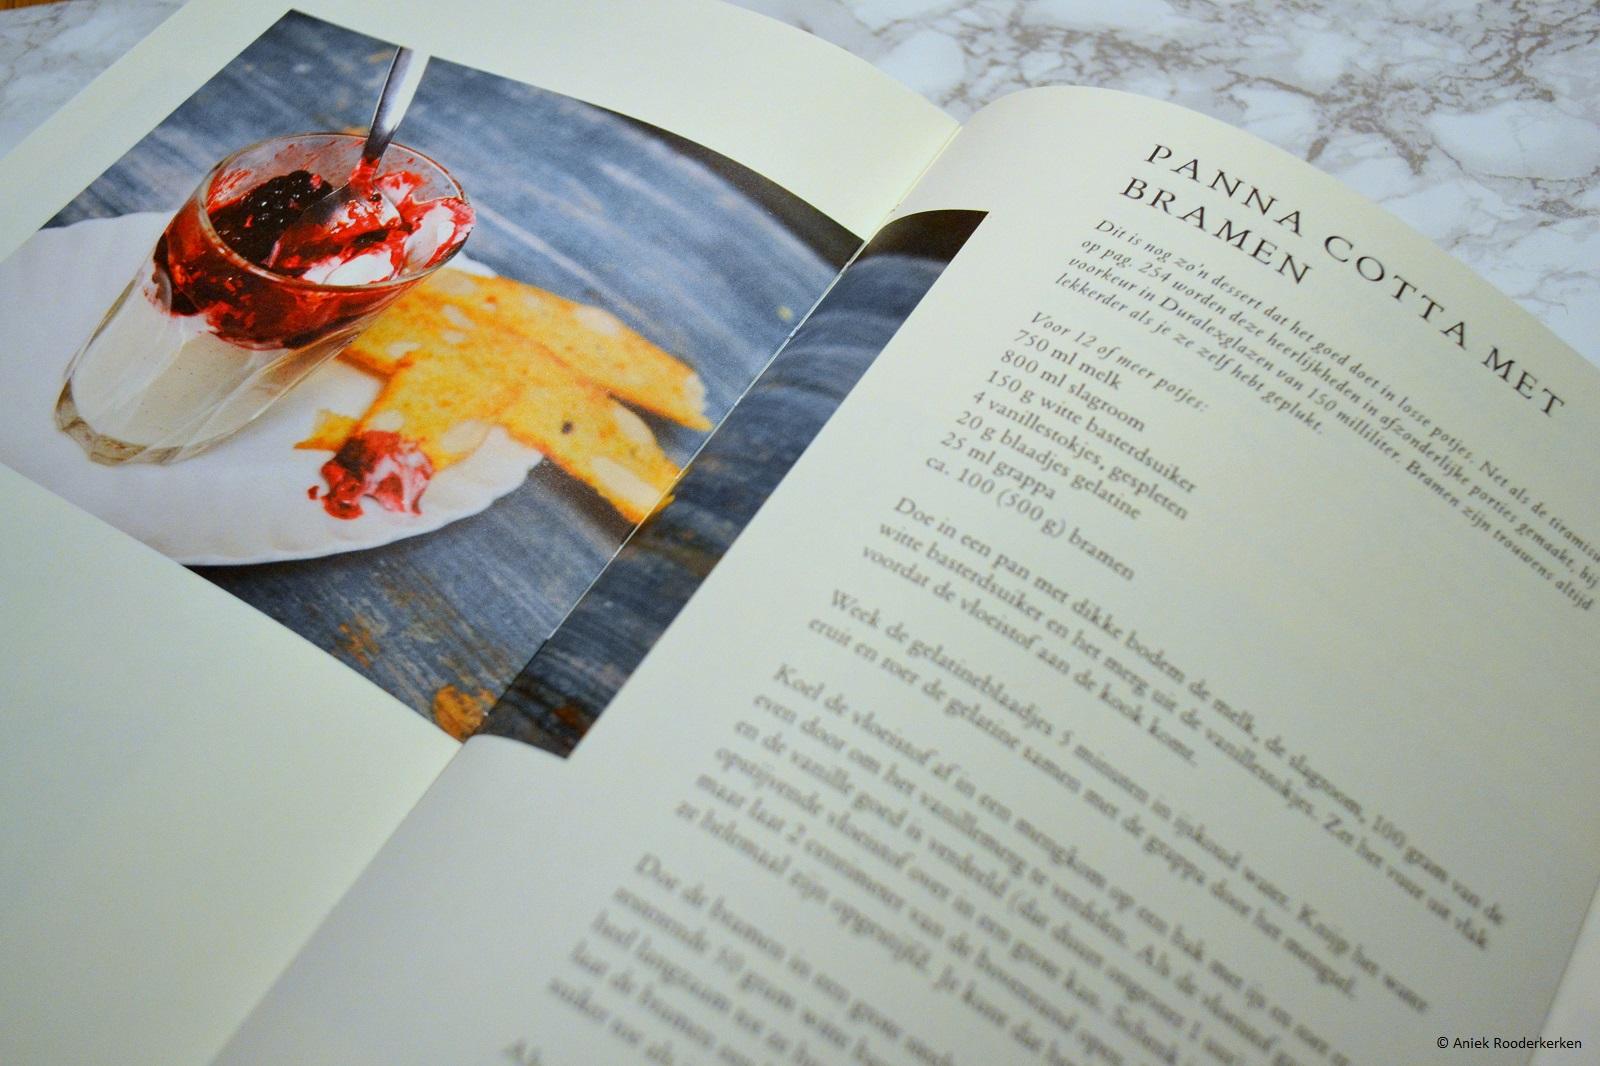 Recept voor Panna Cotto. Polpo, Russell Norman